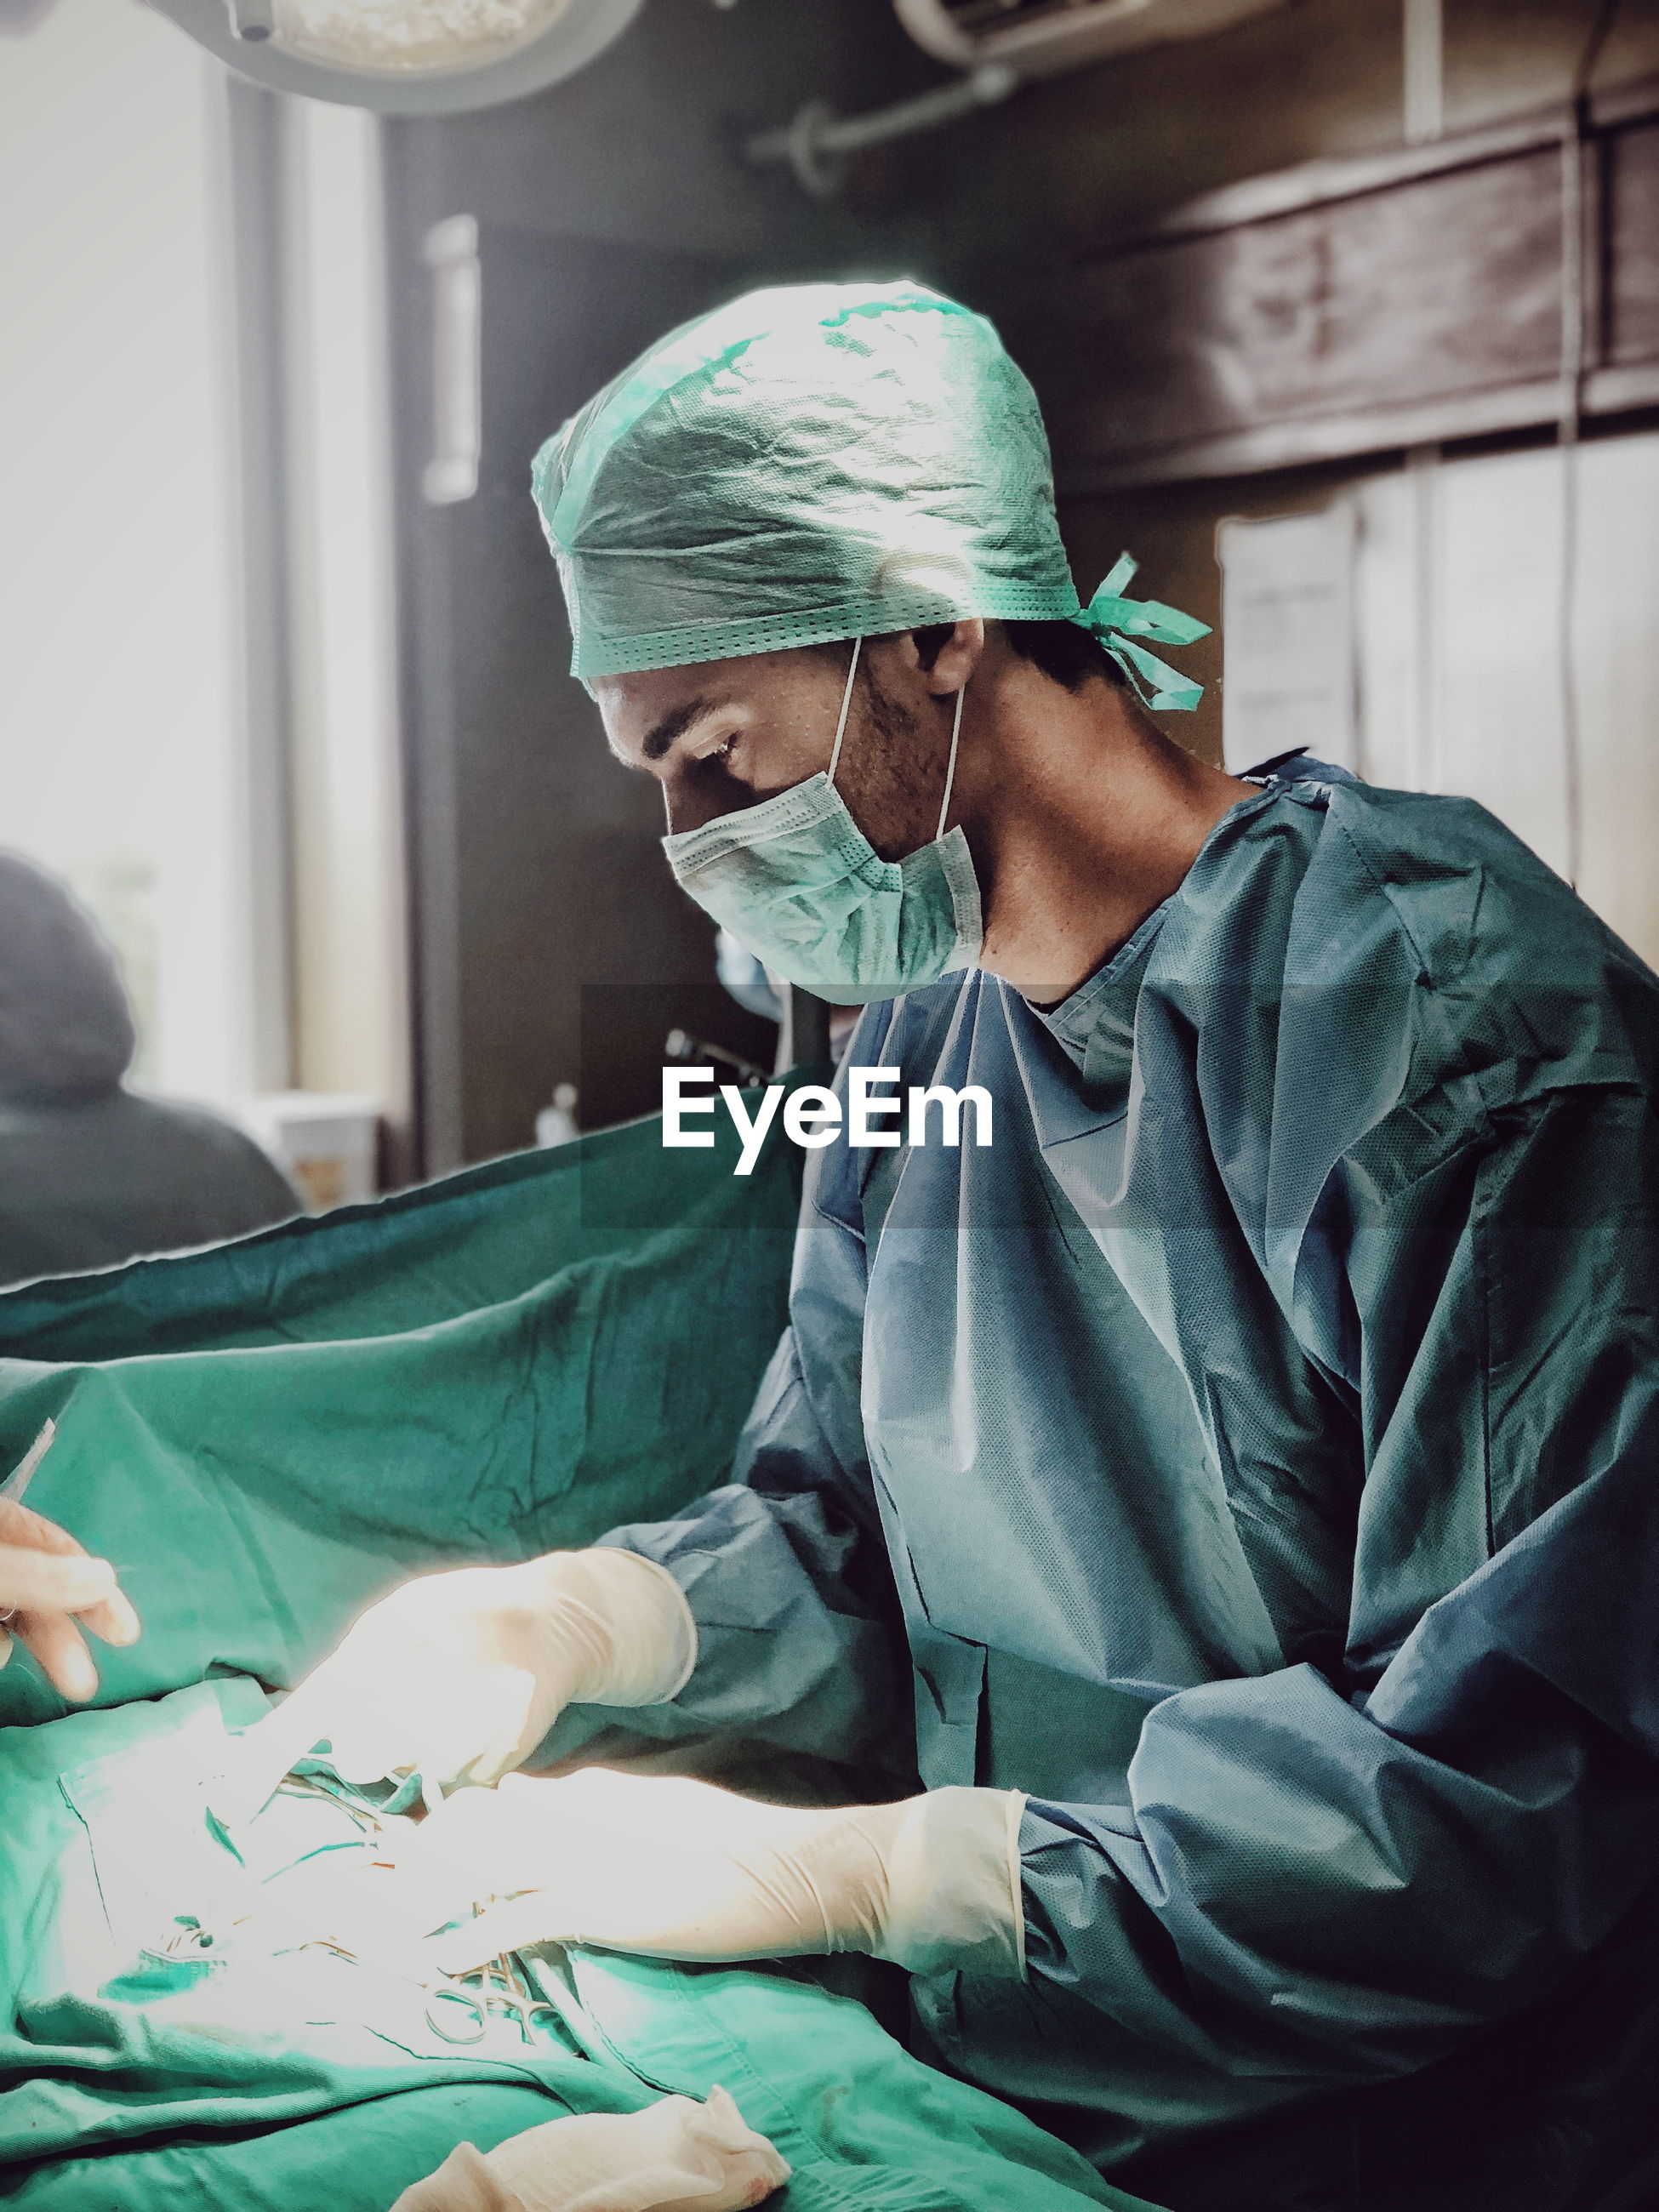 Surgeon picking tools at operating room